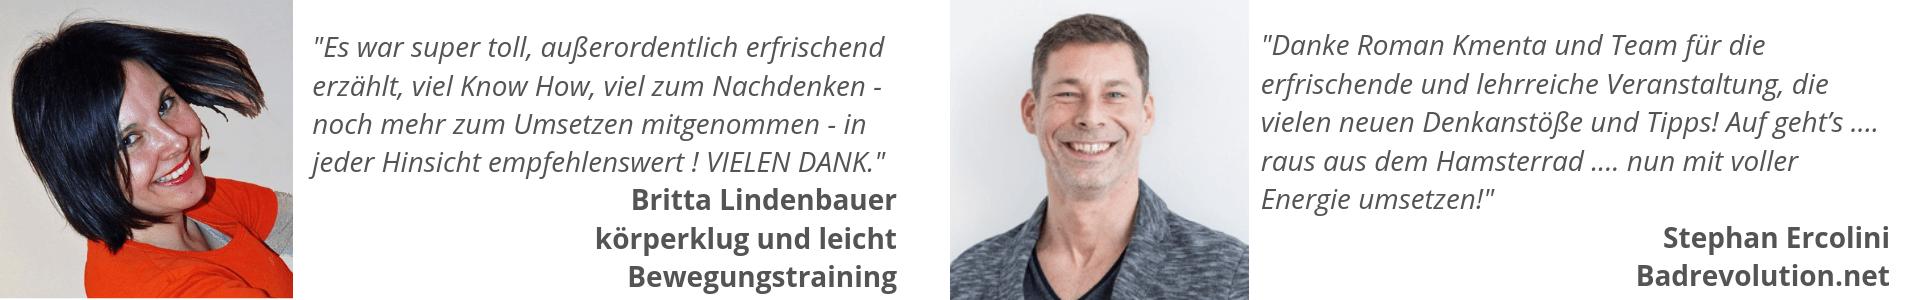 Feedbacks EBDL Strategietag Roman Kmenta